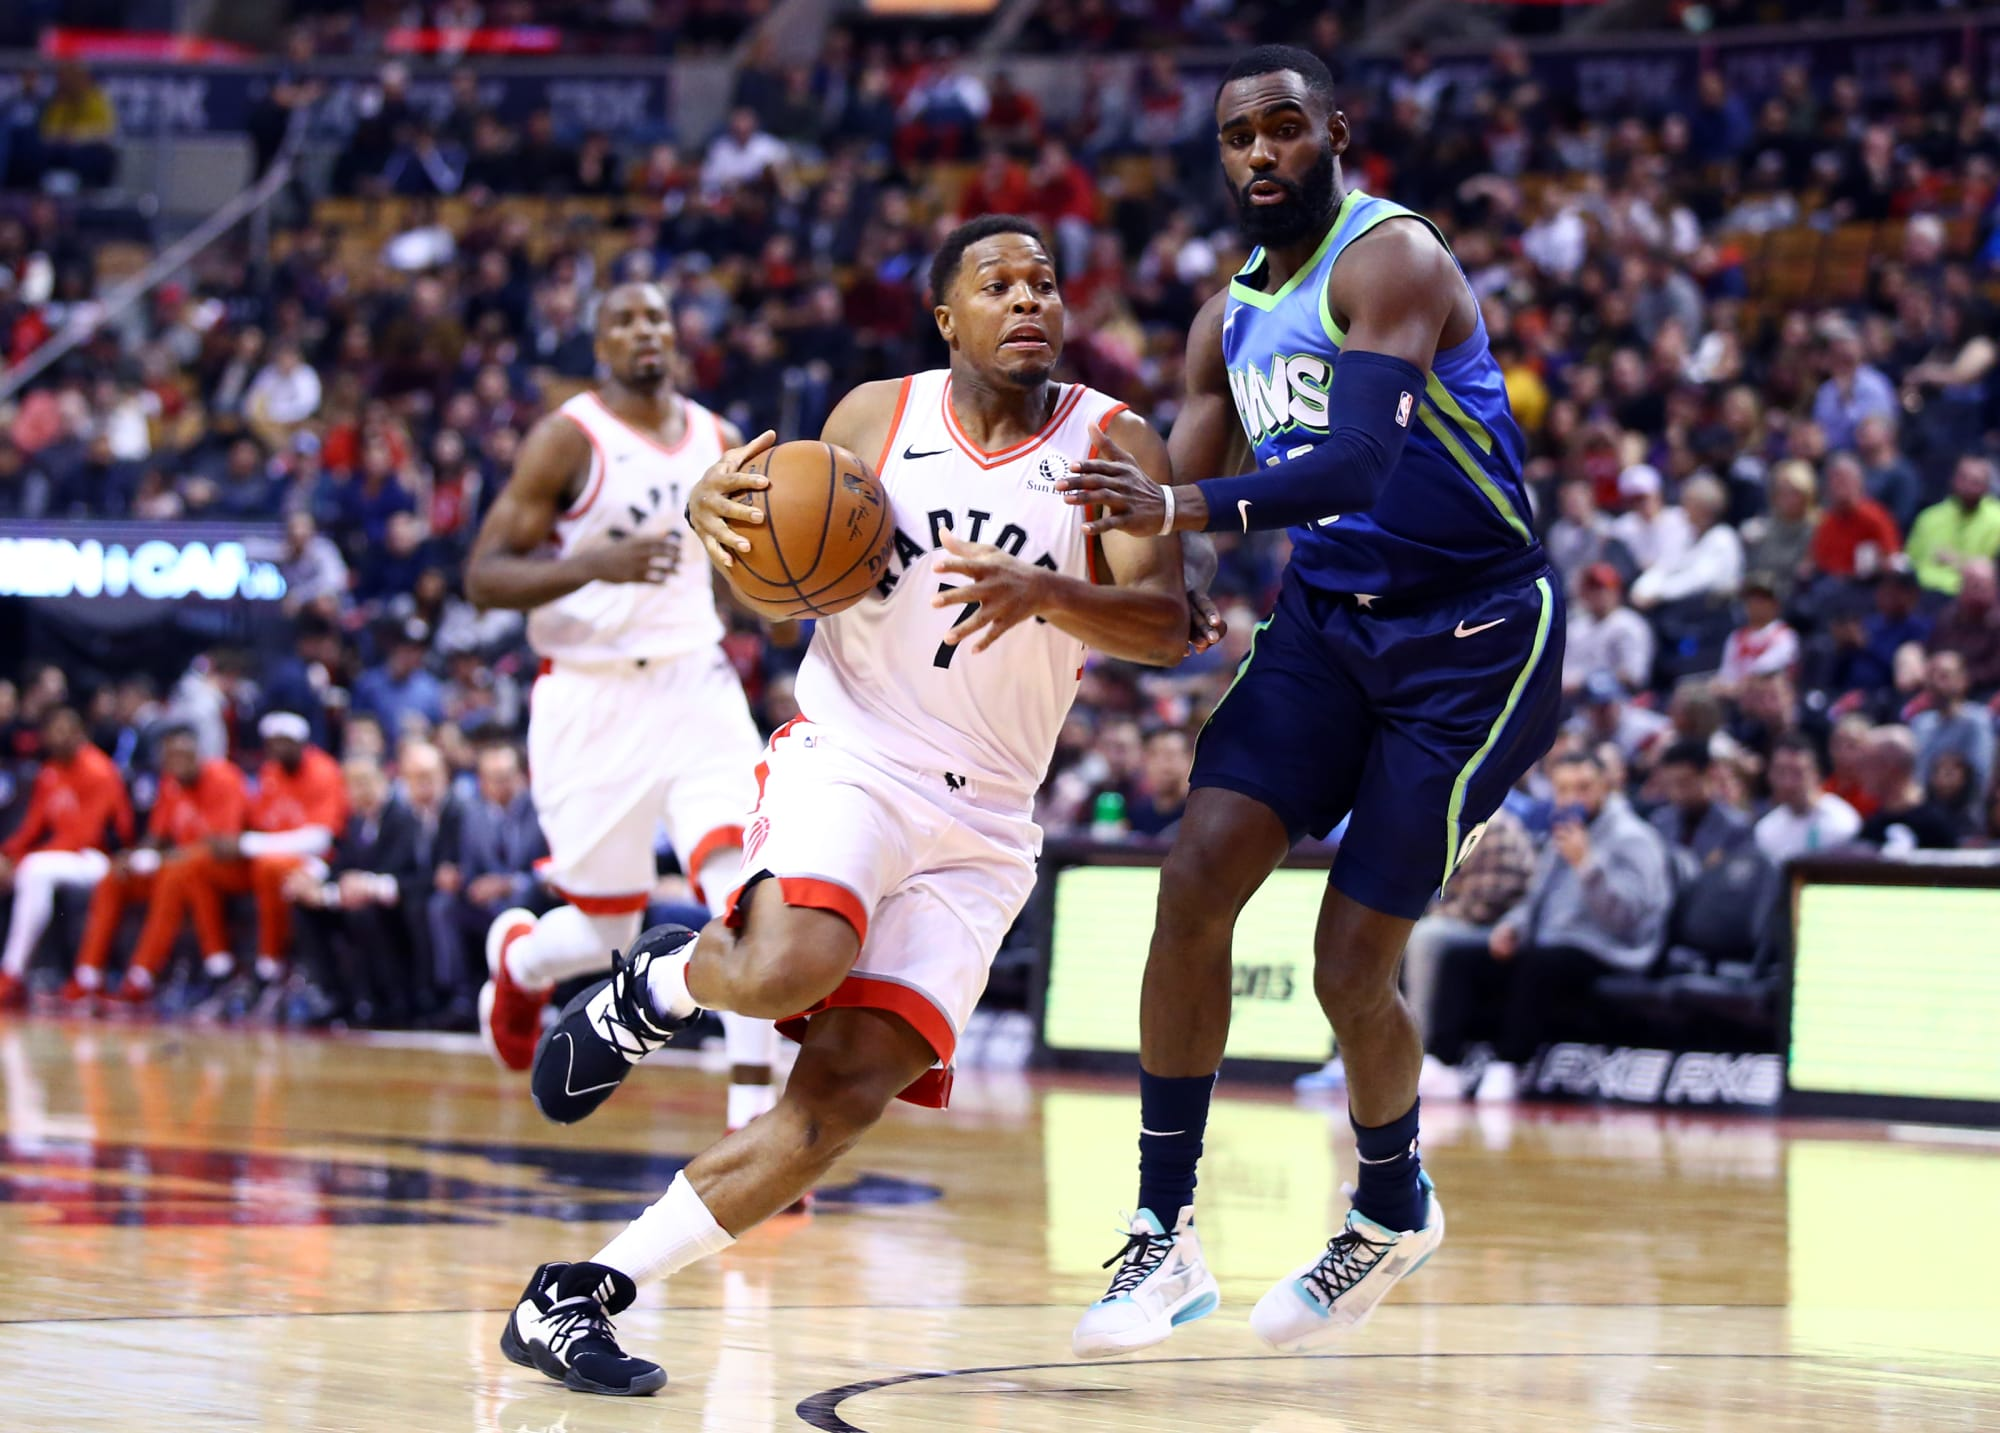 Top five Toronto Raptors' games of the 2019-20 NBA season